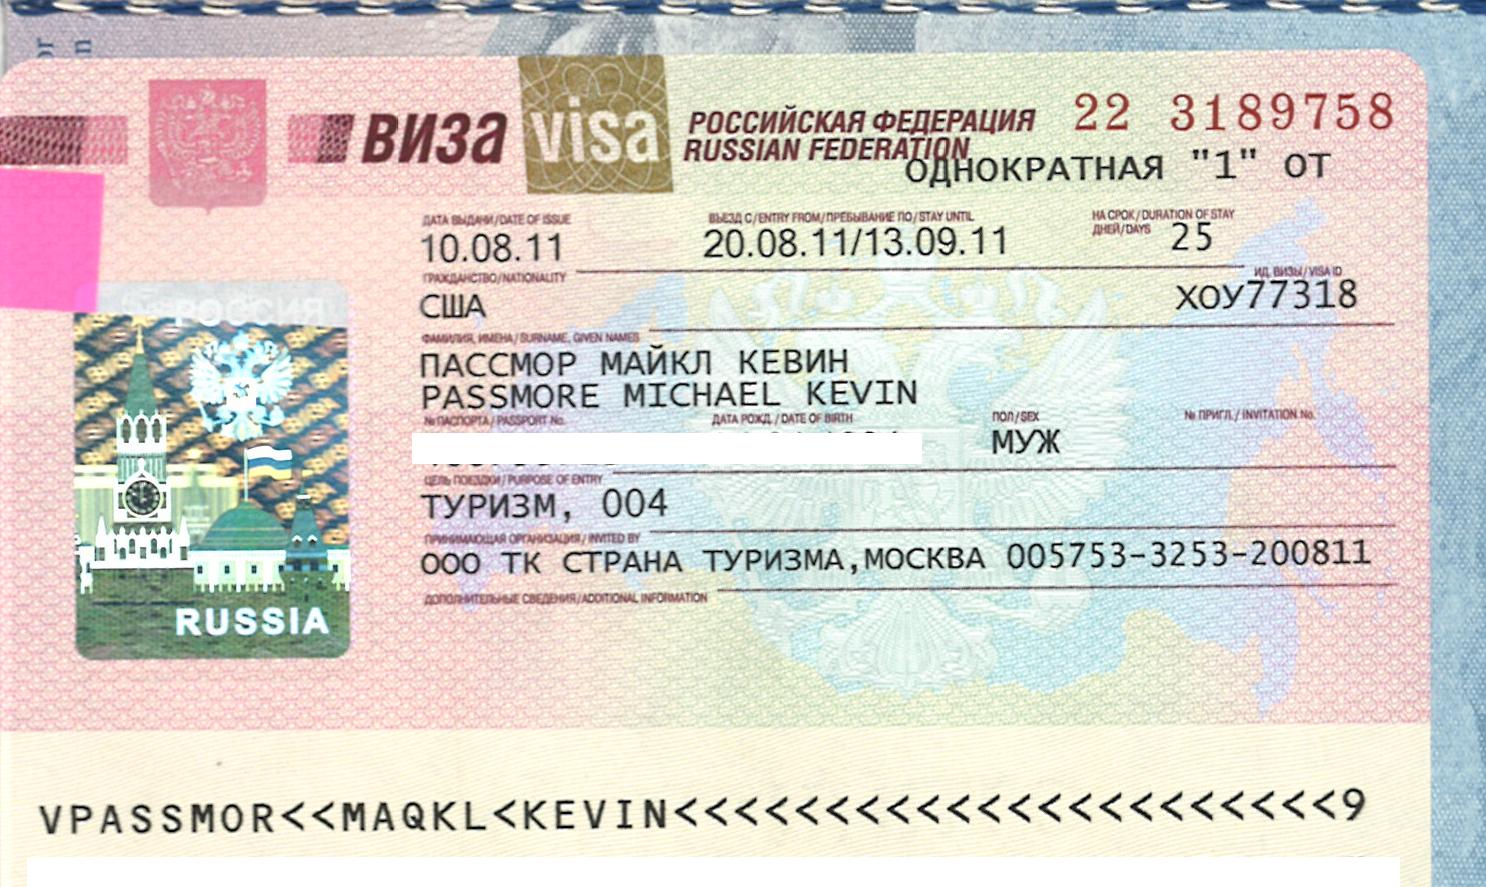 Visa-3 Online Visa Application Form For Schengen on word world, requirements for,